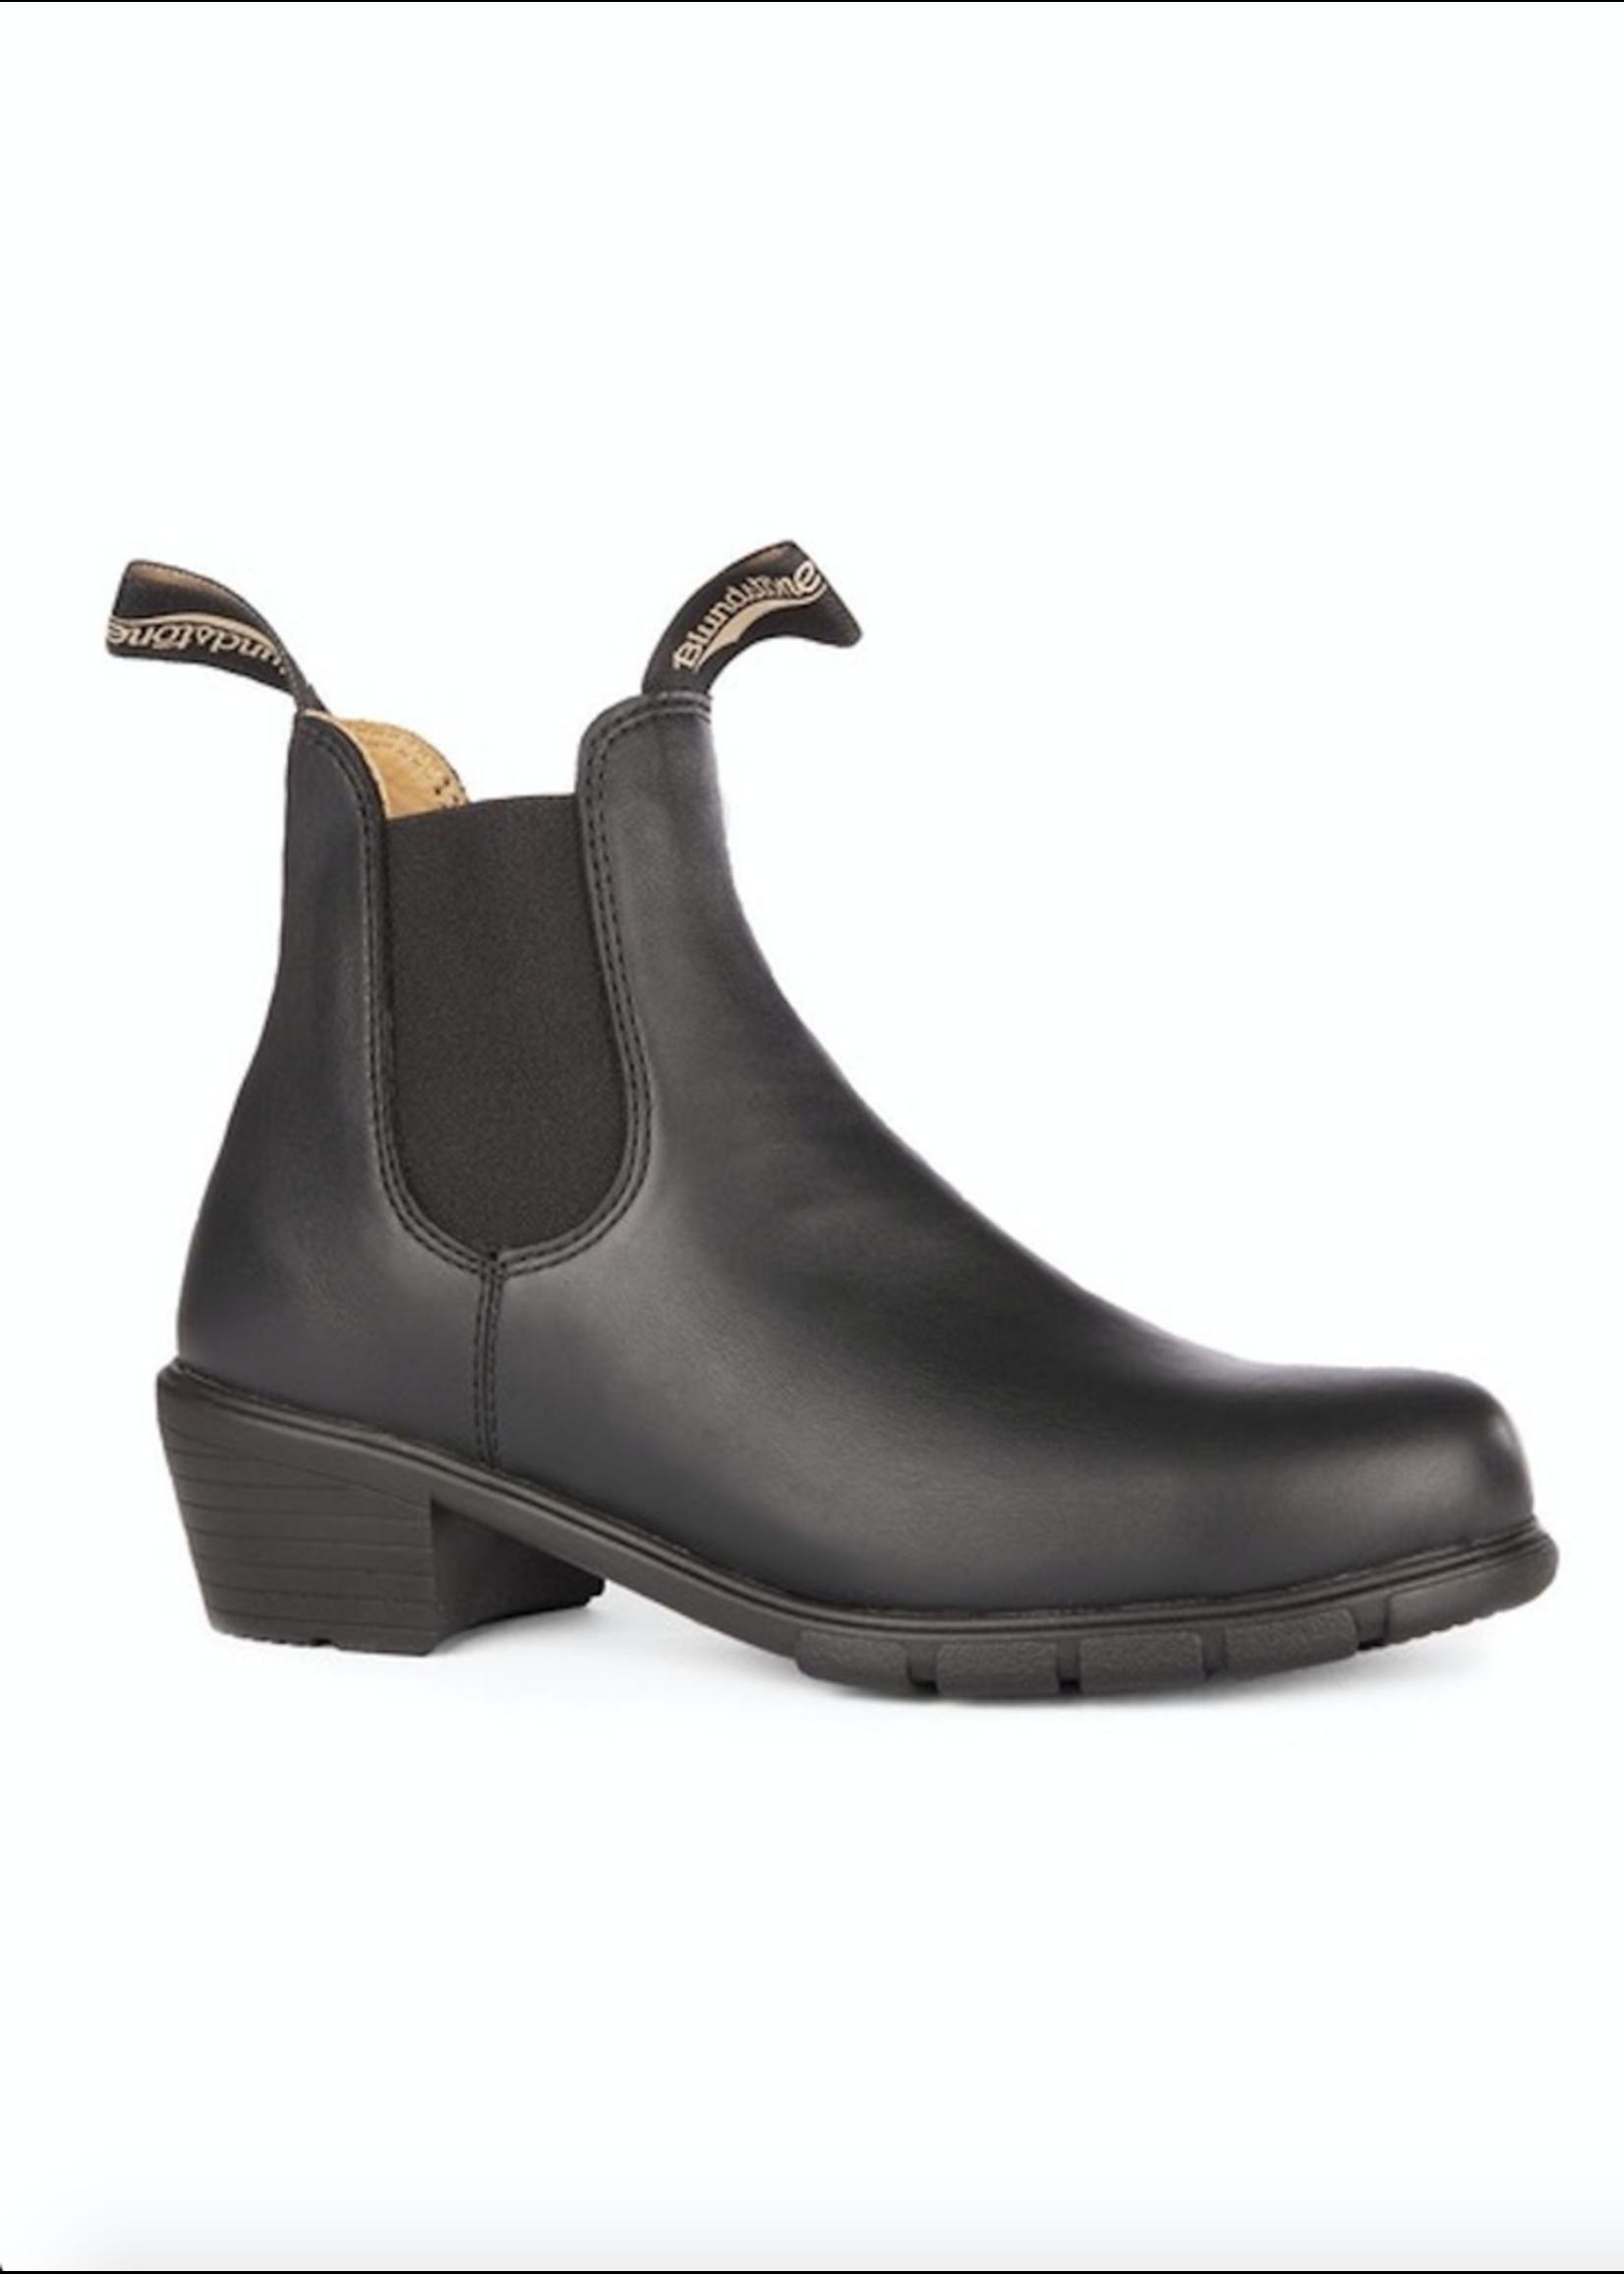 Blundstone Blundstone 1671 - Women's Series Heel Black